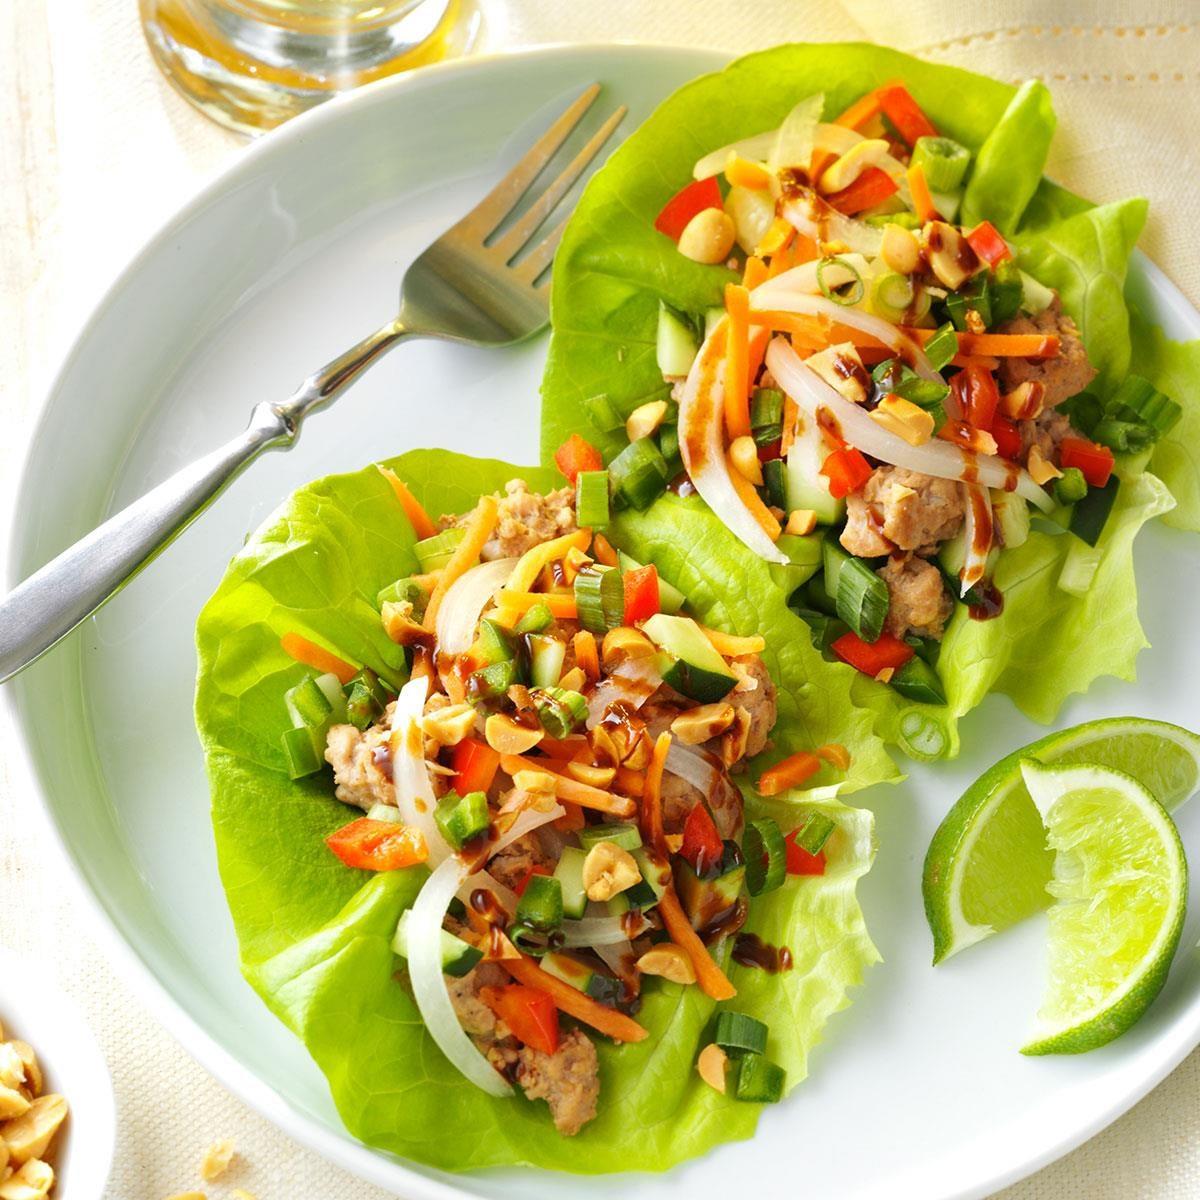 Vietnamese Pork Lettuce Wraps Recipe | Taste of Home